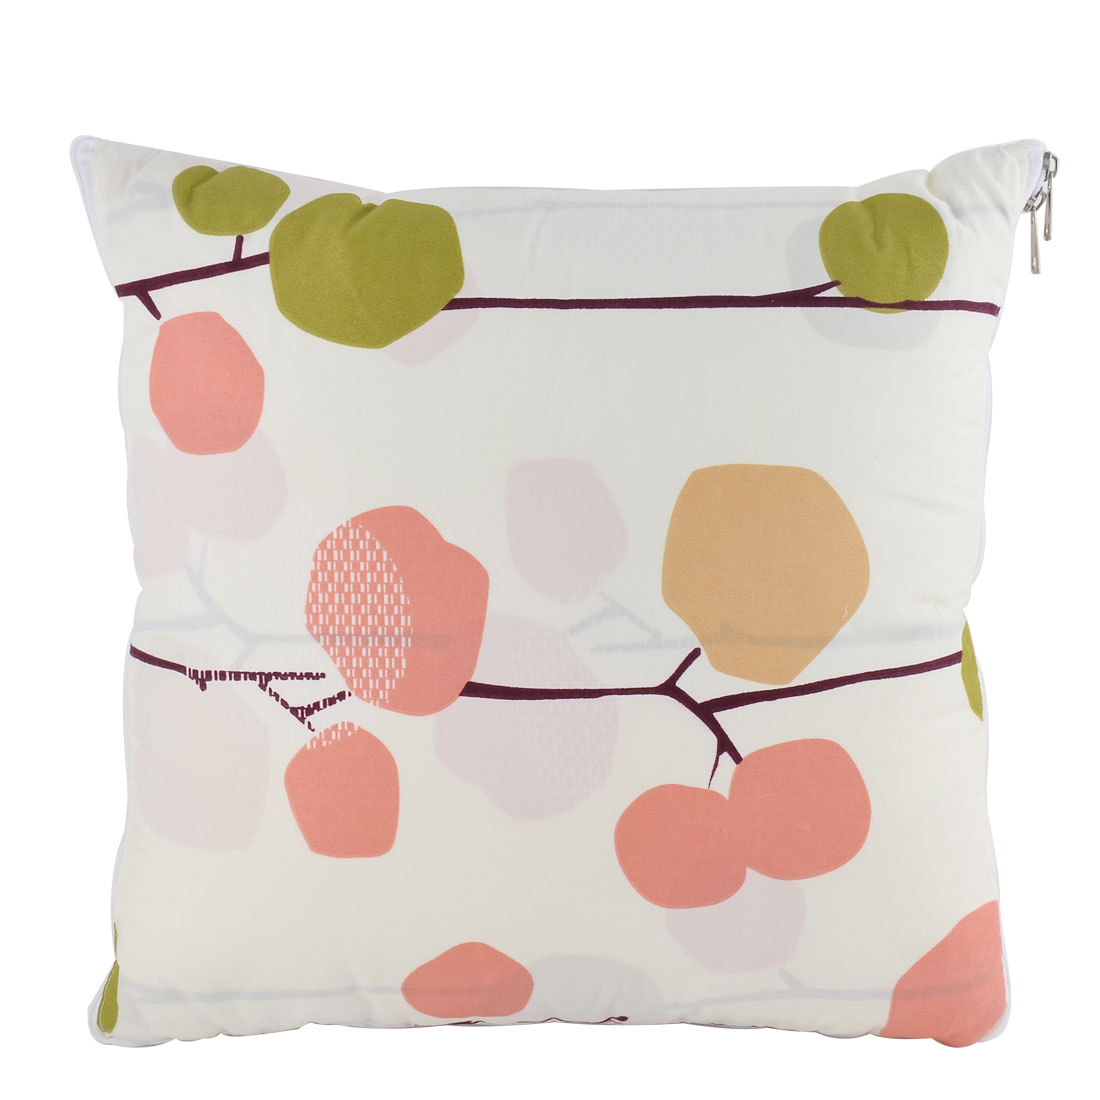 Home Office Car Cotton Blends Fruit Tree Print Zippered Pillow Cushion Quilt Dual 40 x 40cm